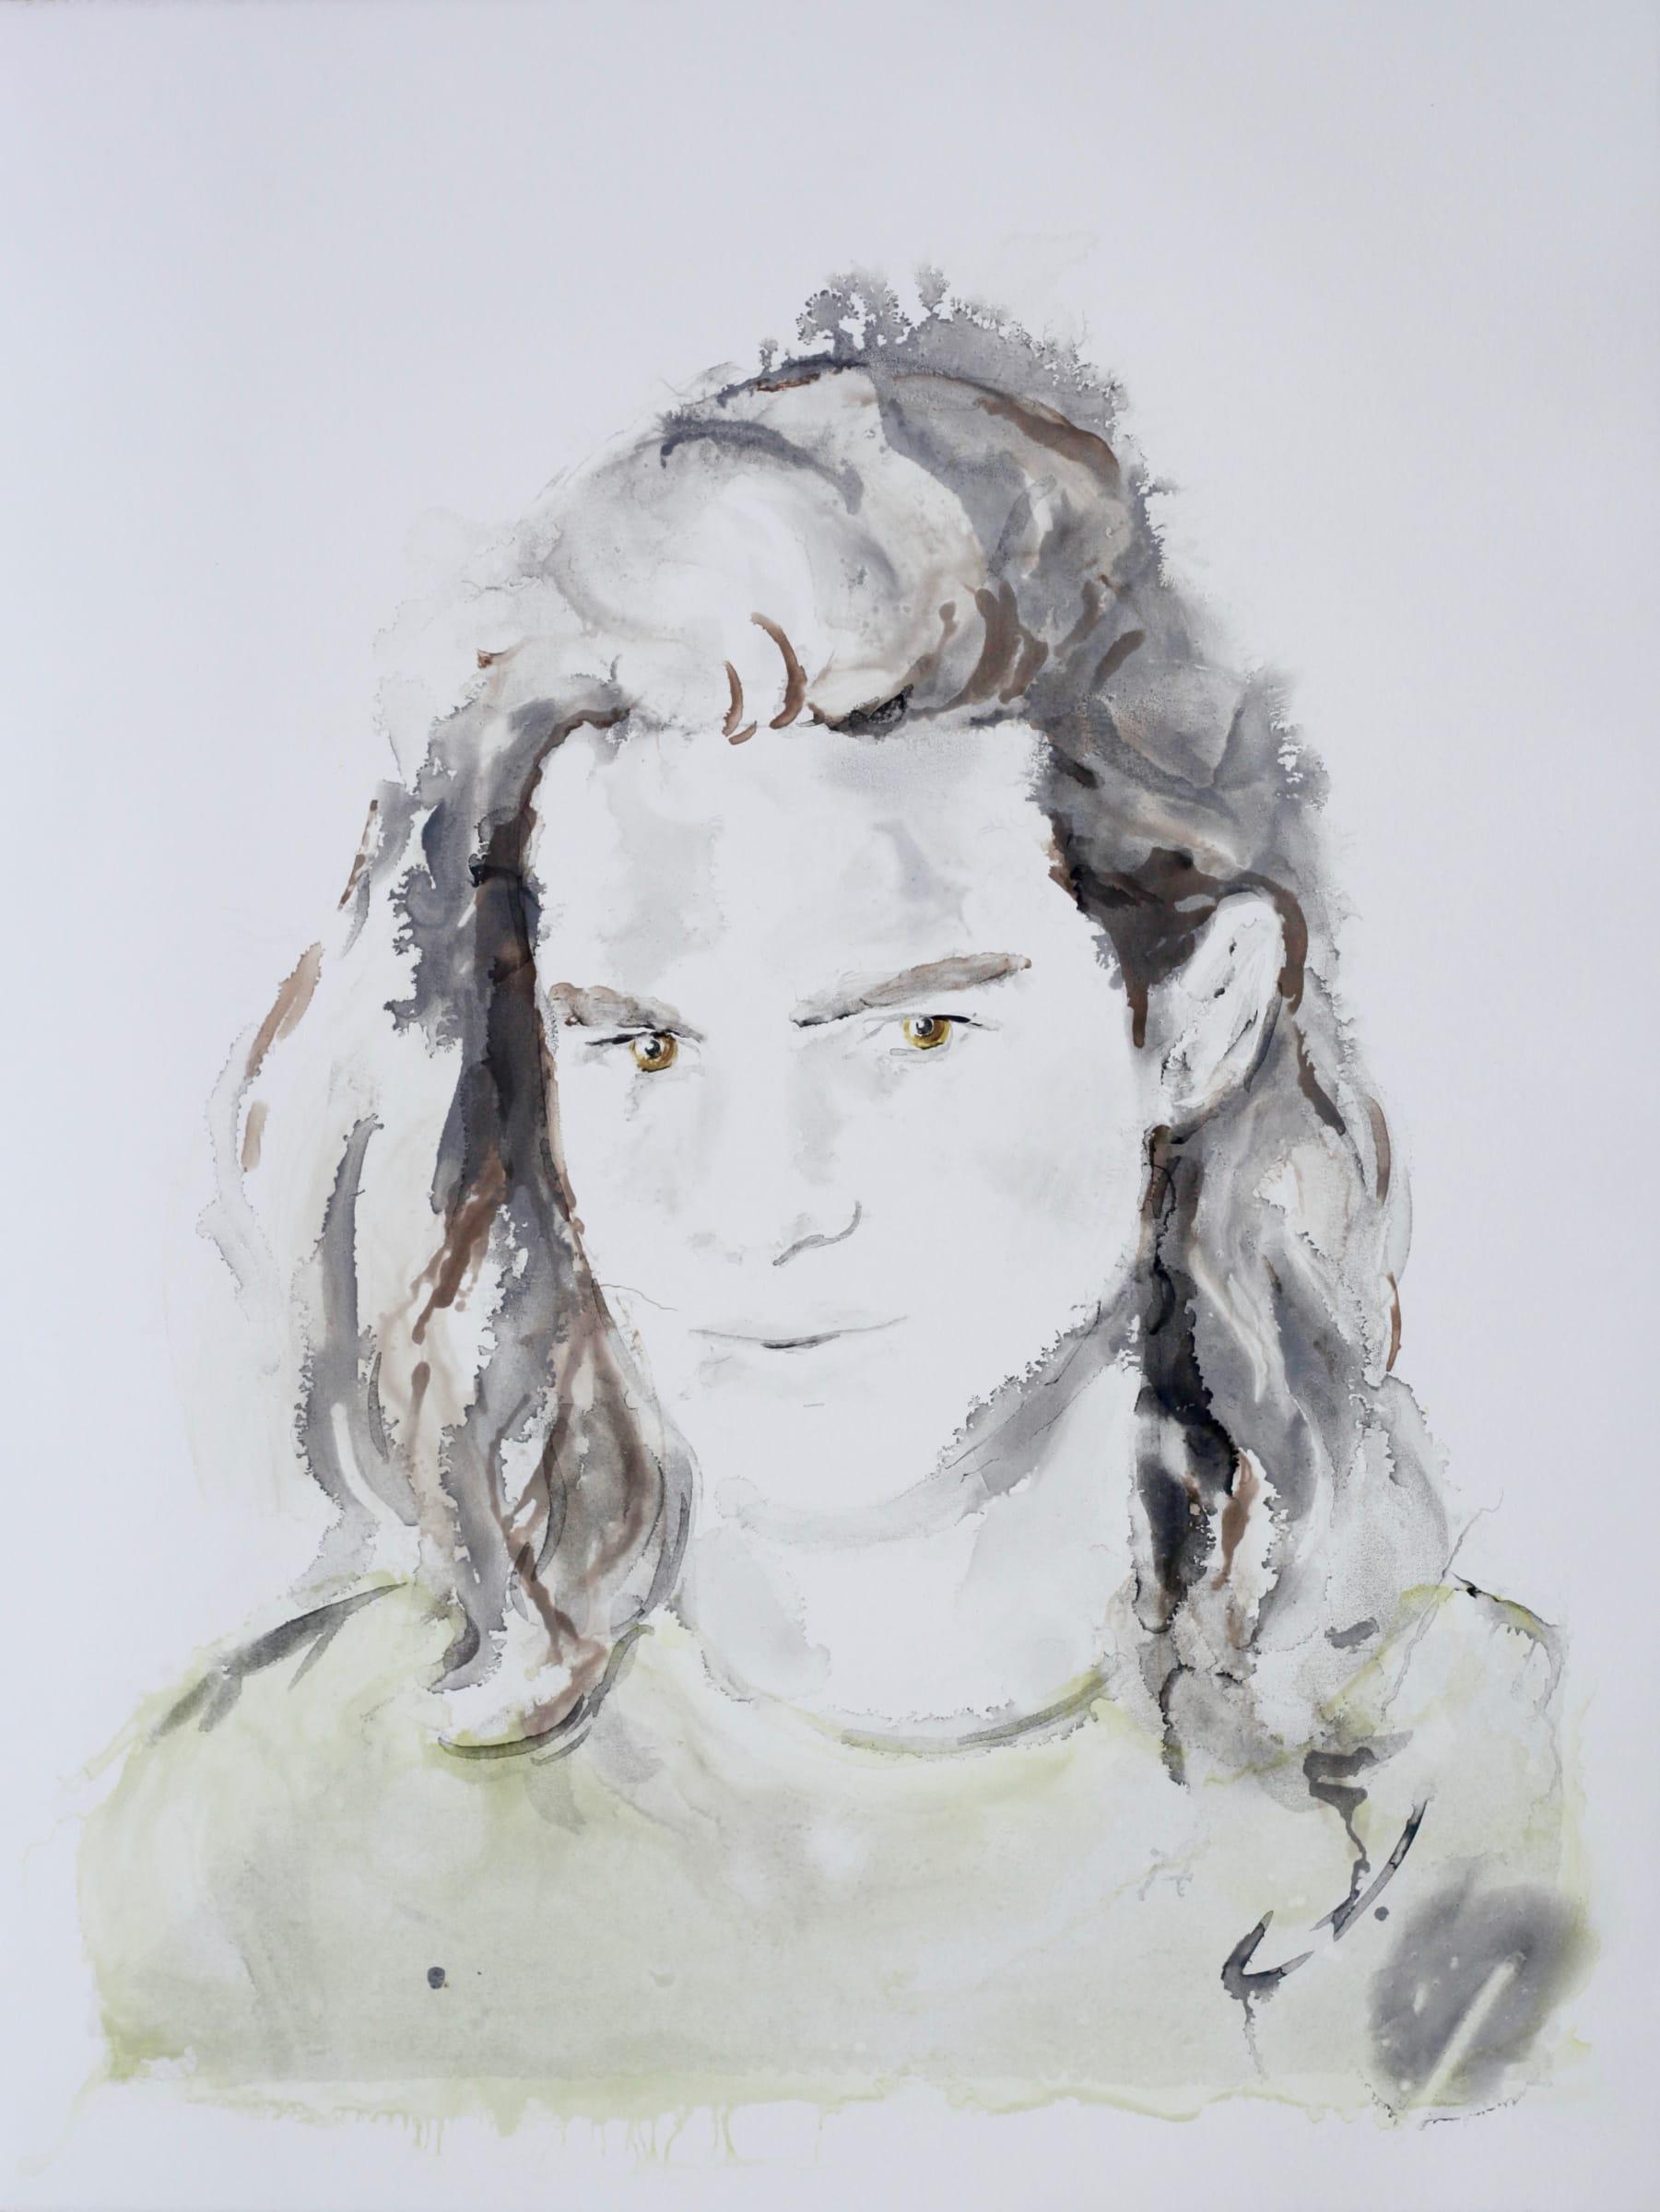 <span class=&#34;link fancybox-details-link&#34;><a href=&#34;/artworks/categories/86/3097-craig-cameron-mackintosh-peter-raven-ii-2016/&#34;>View Detail Page</a></span><div class=&#34;artist&#34;><strong>Craig Cameron-Mackintosh</strong></div> <div class=&#34;title&#34;><em>Peter-Raven II</em>, 2016</div> <div class=&#34;medium&#34;>Monotype On Arches Johannot Paper</div> <div class=&#34;dimensions&#34;>65cm x 50cm</div><div class=&#34;price&#34;>R4,600.00</div>